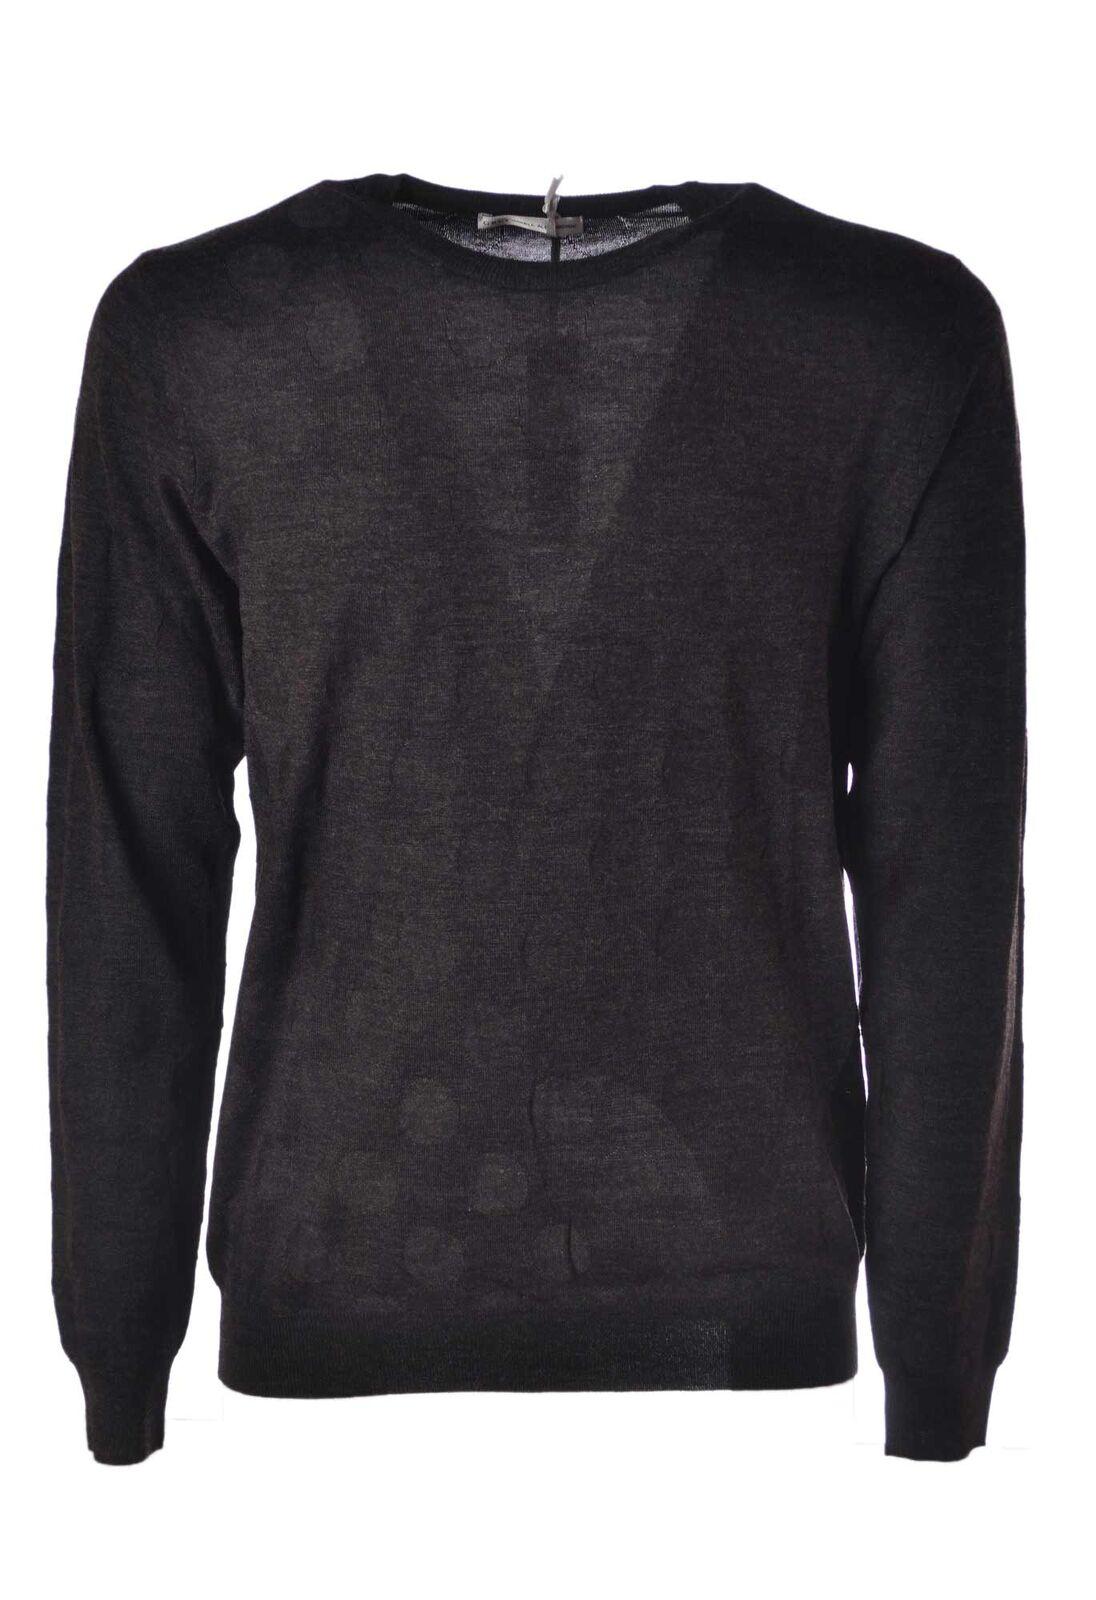 Daniele Alessandrini  -  Sweaters - Male - Grau - 4384112A184609